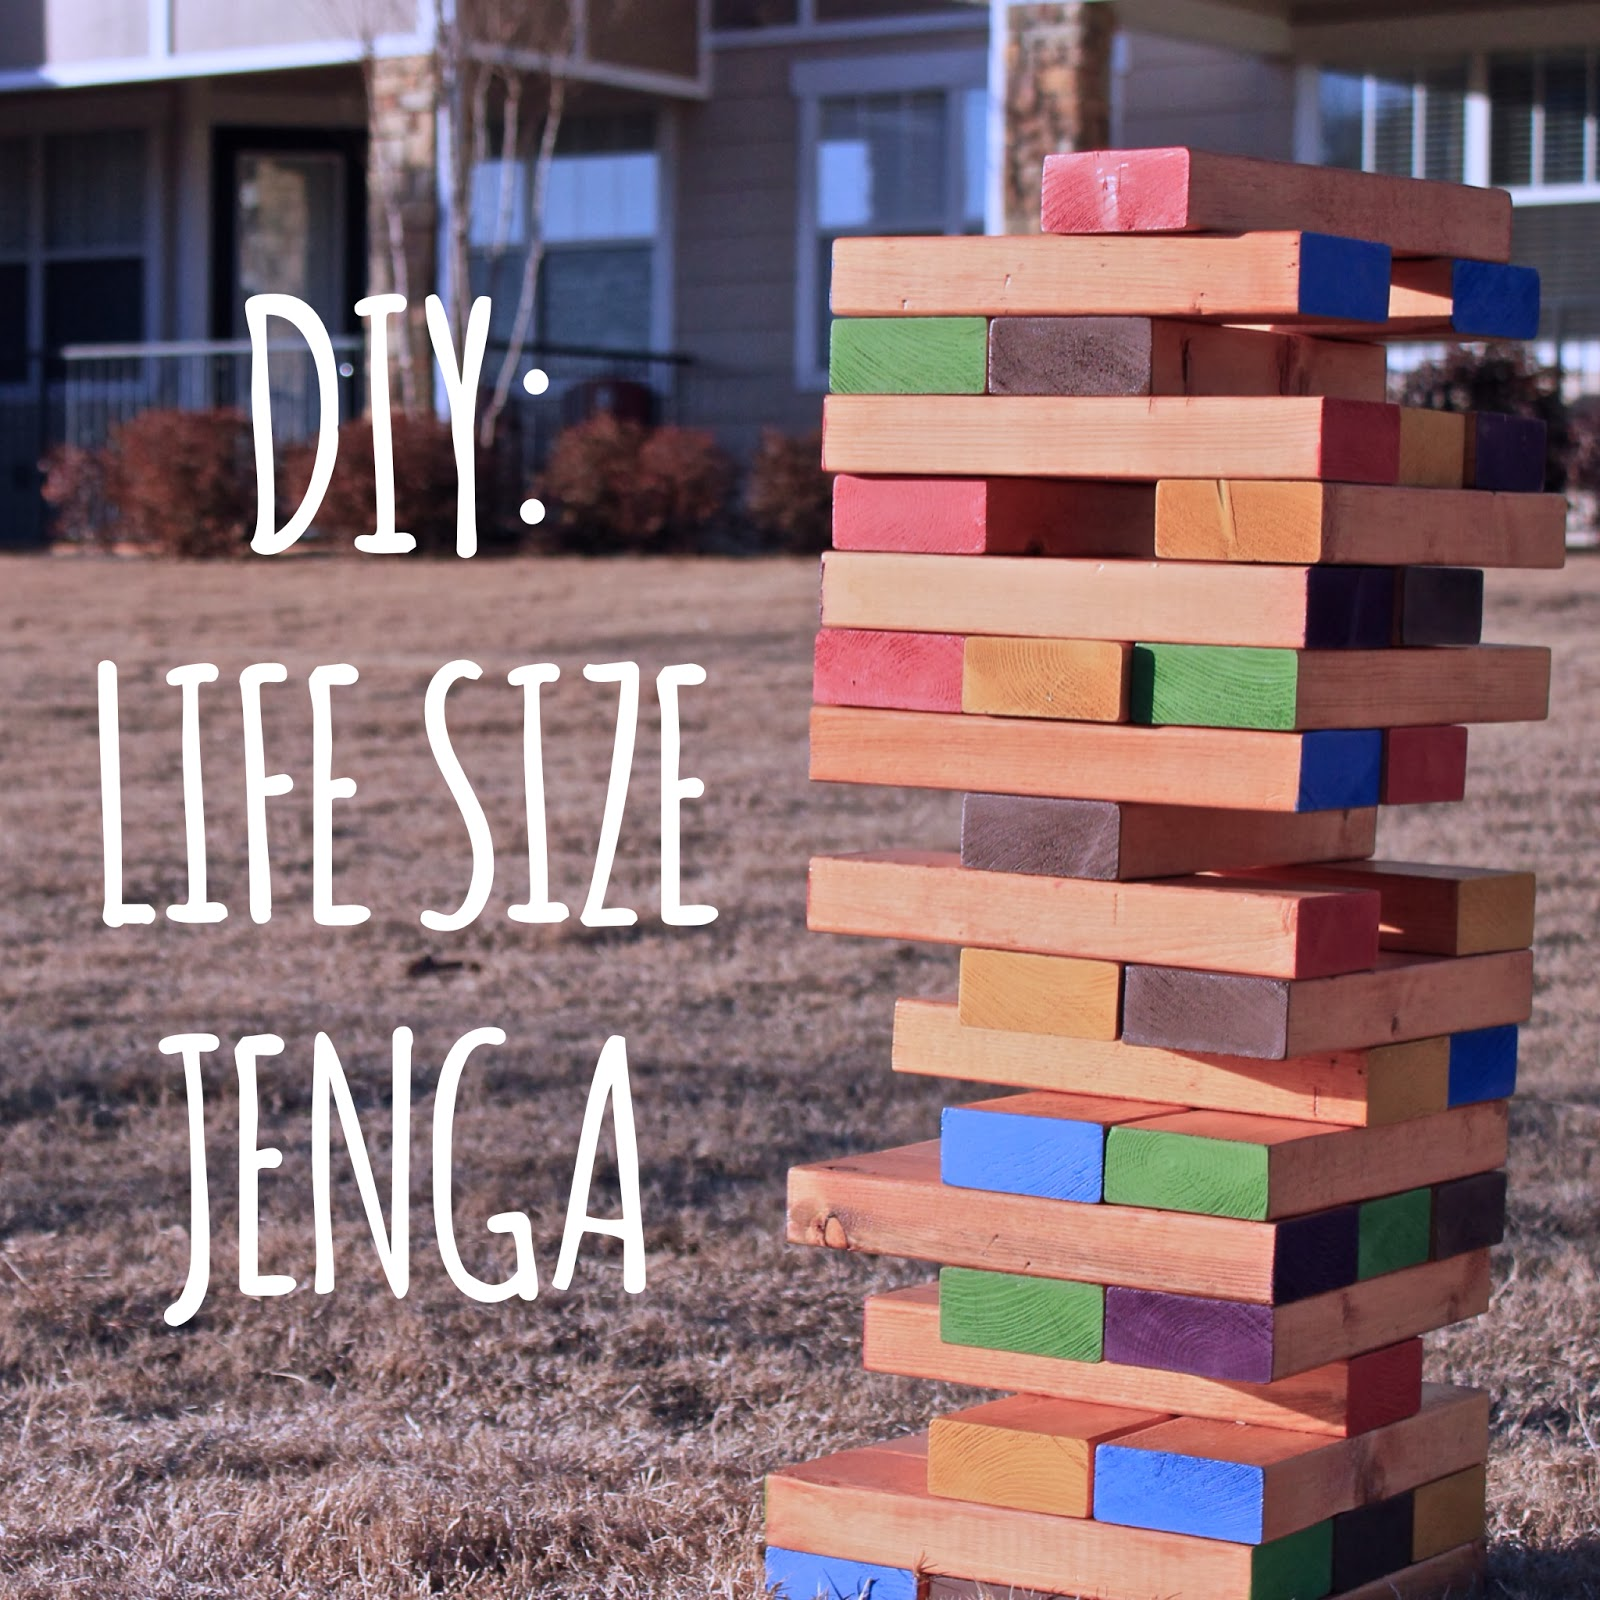 Life Size Jenga >> Diy Lifesize Jenga Hansen Heidelberg Diy Lifesize Jenga